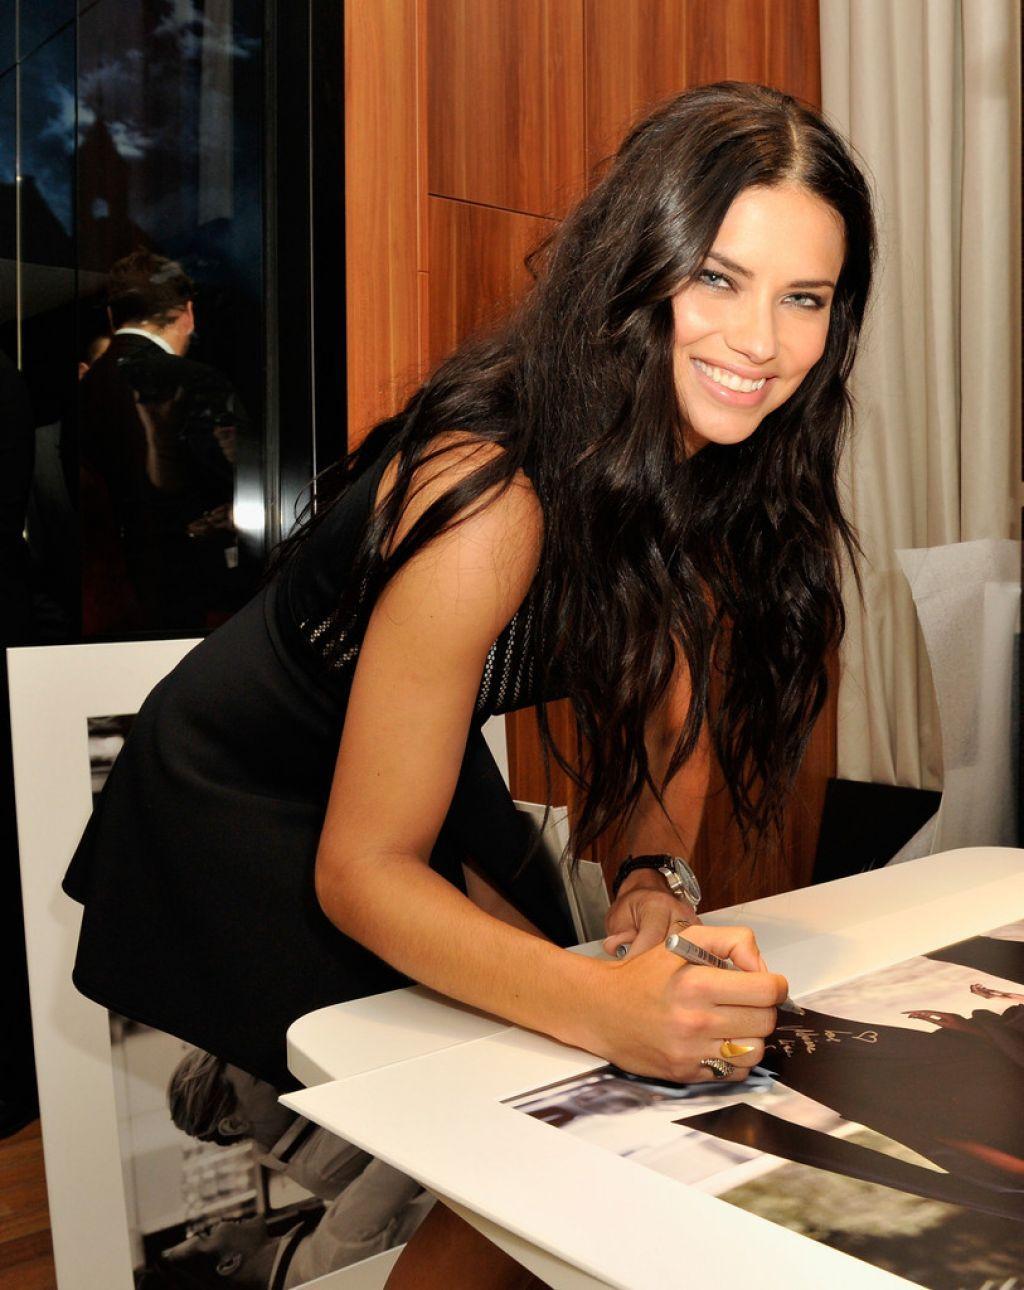 Adriana lima hairstyles 2014 - Adriana Lima 2015 Google Search